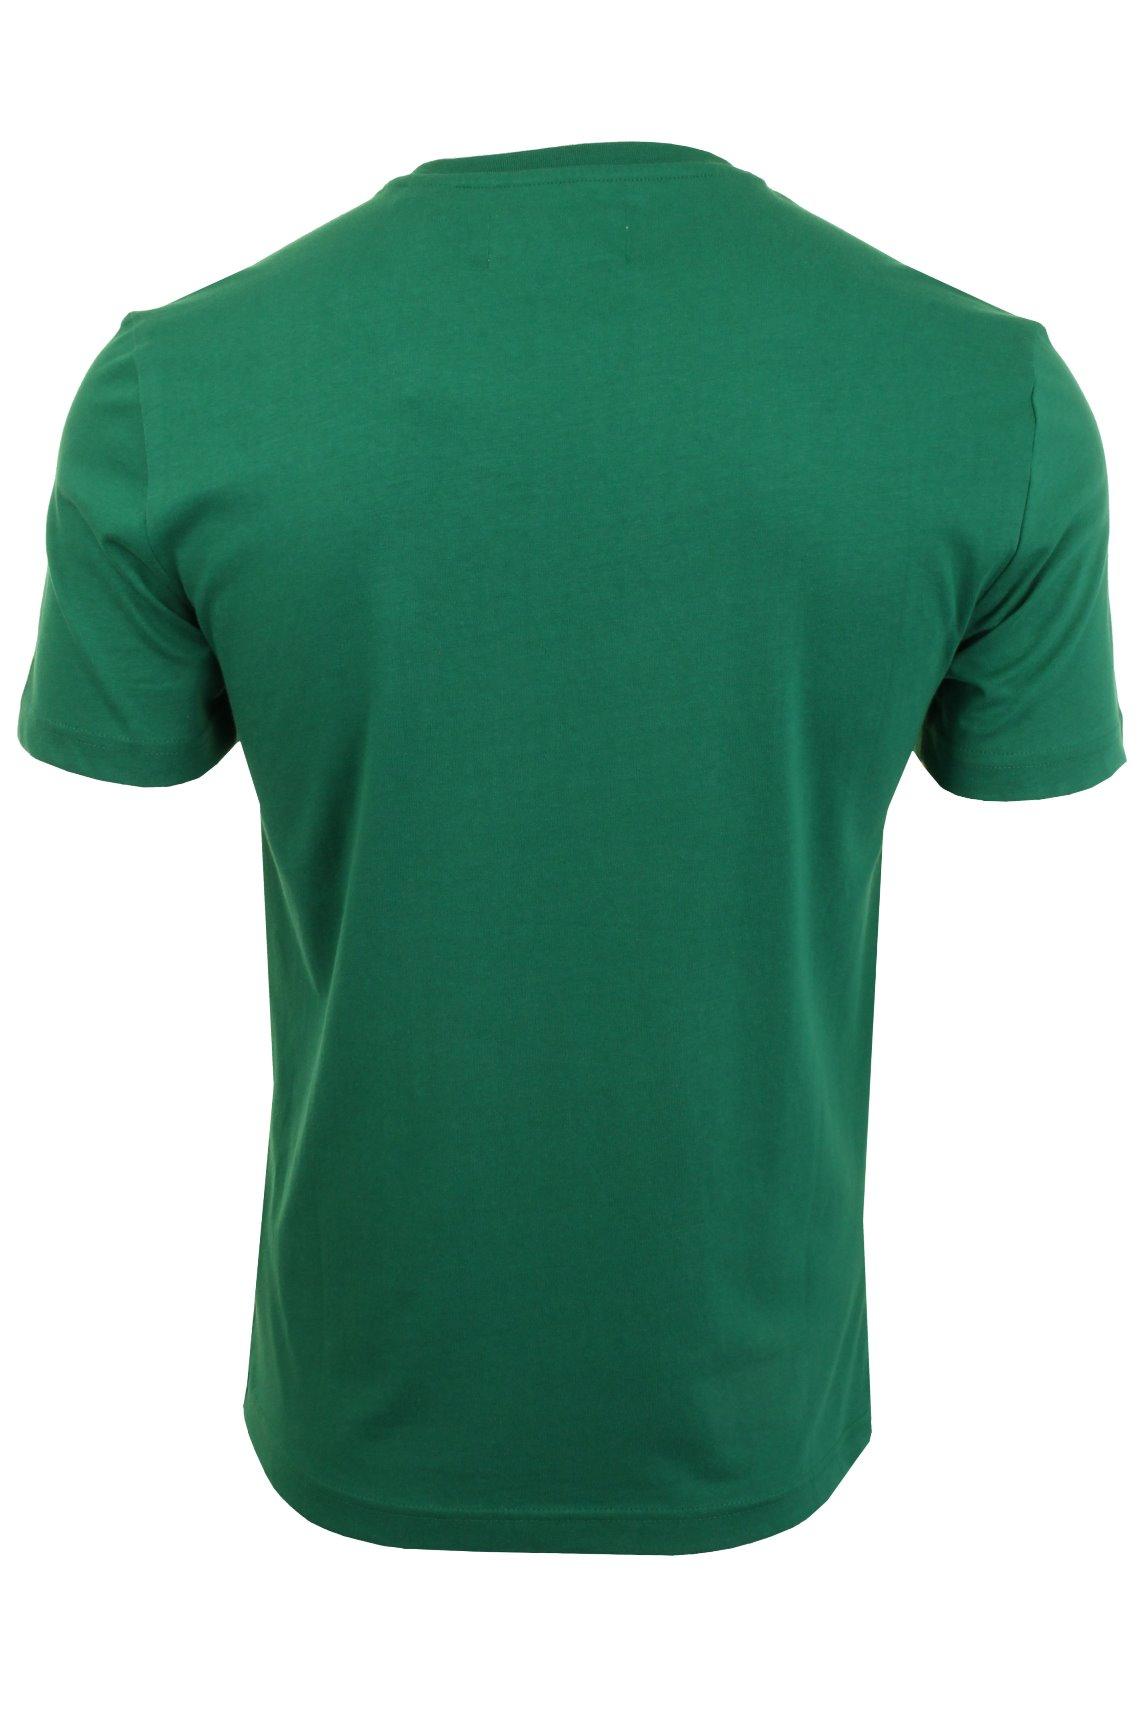 Mens-T-Shirt-by-Original-Penguin-Crew-Neck-Short-Sleeved thumbnail 44